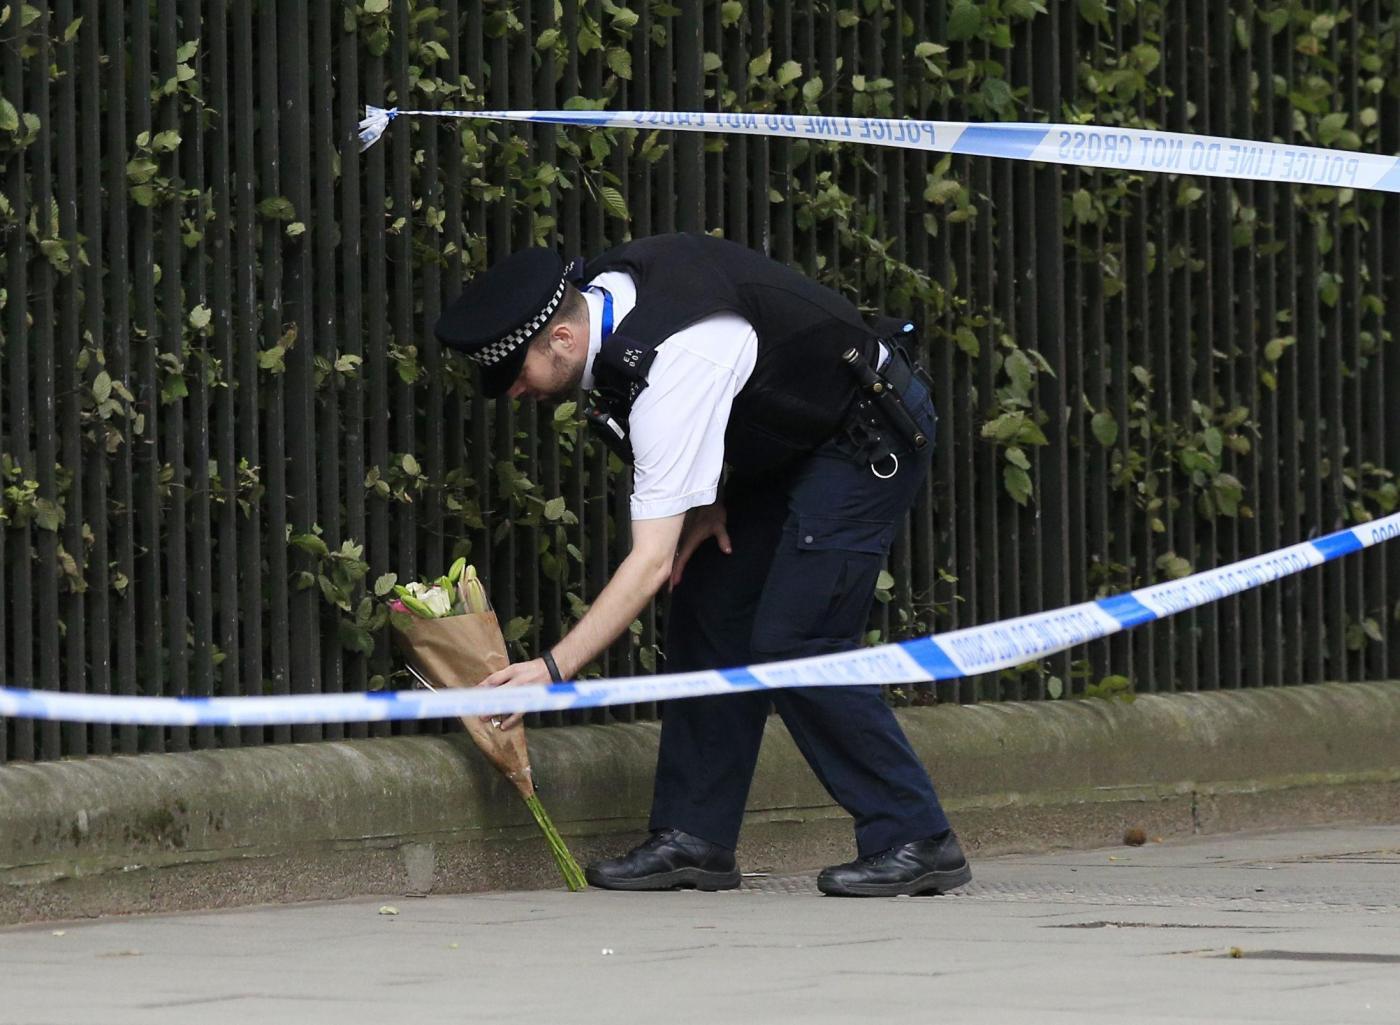 Londra, attacca i passanti a coltellate